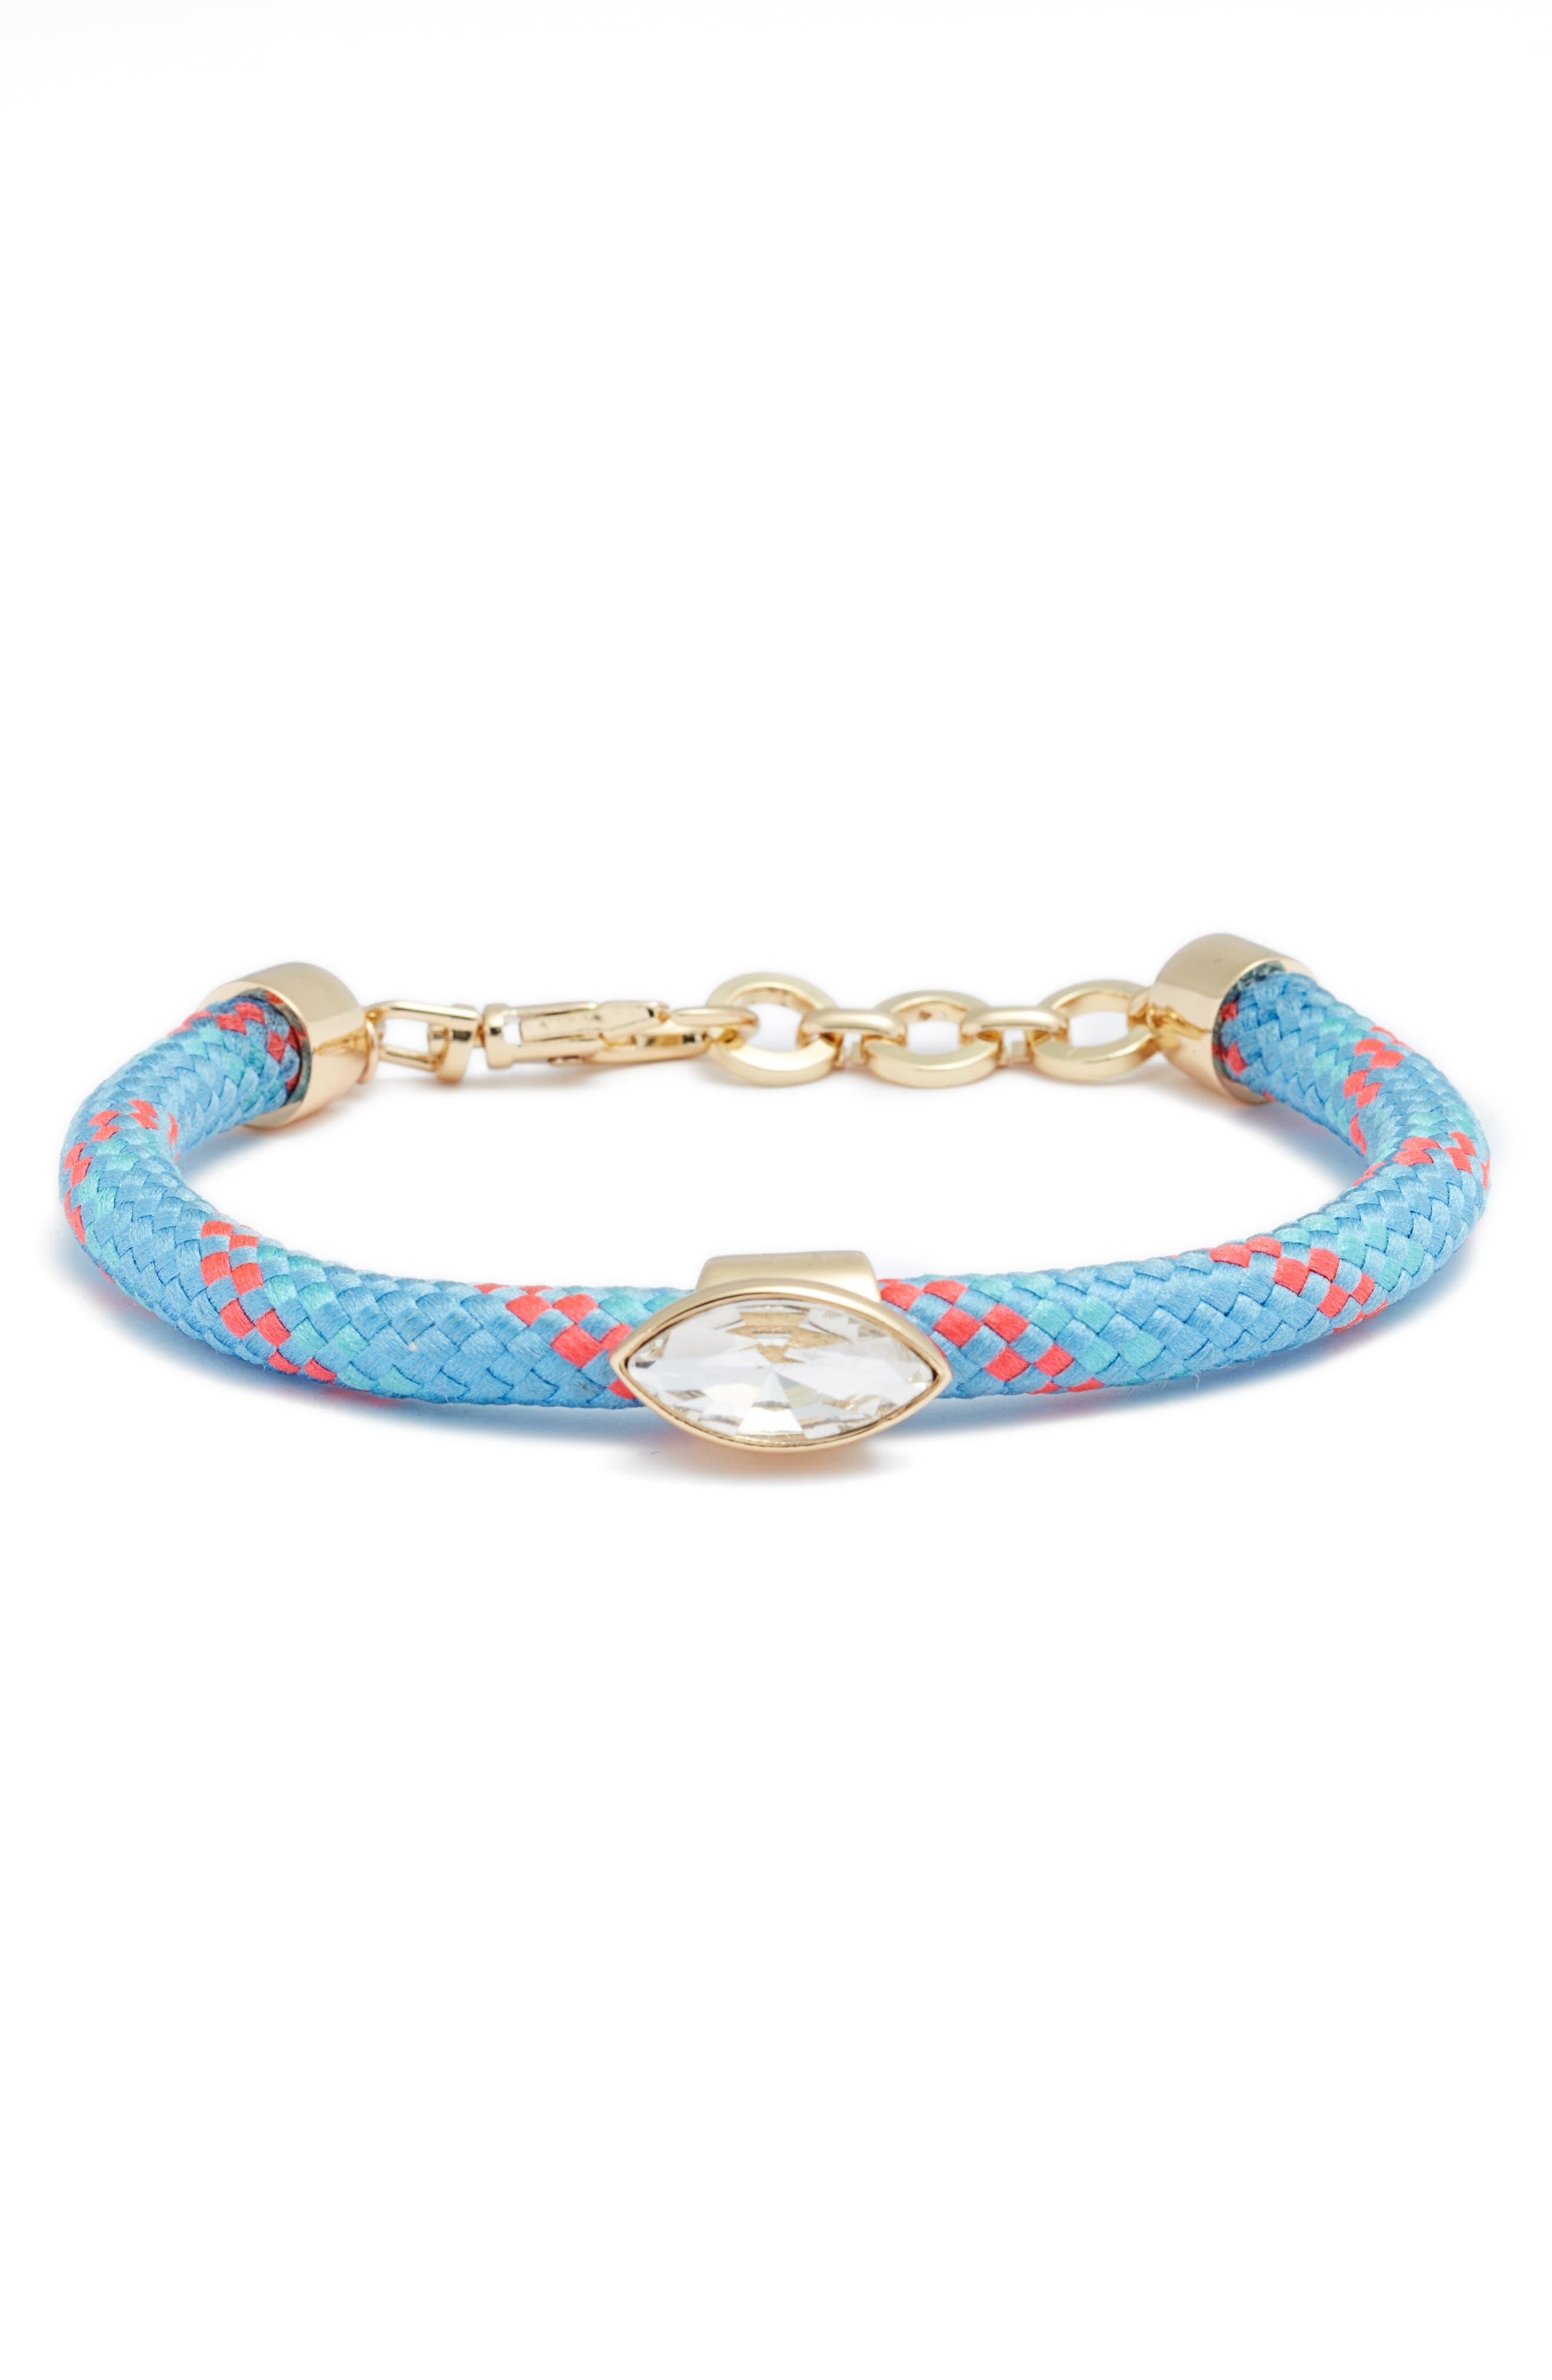 Climbing Rope Bracelet,                             Main thumbnail 1, color,                             Turquoise / Gold